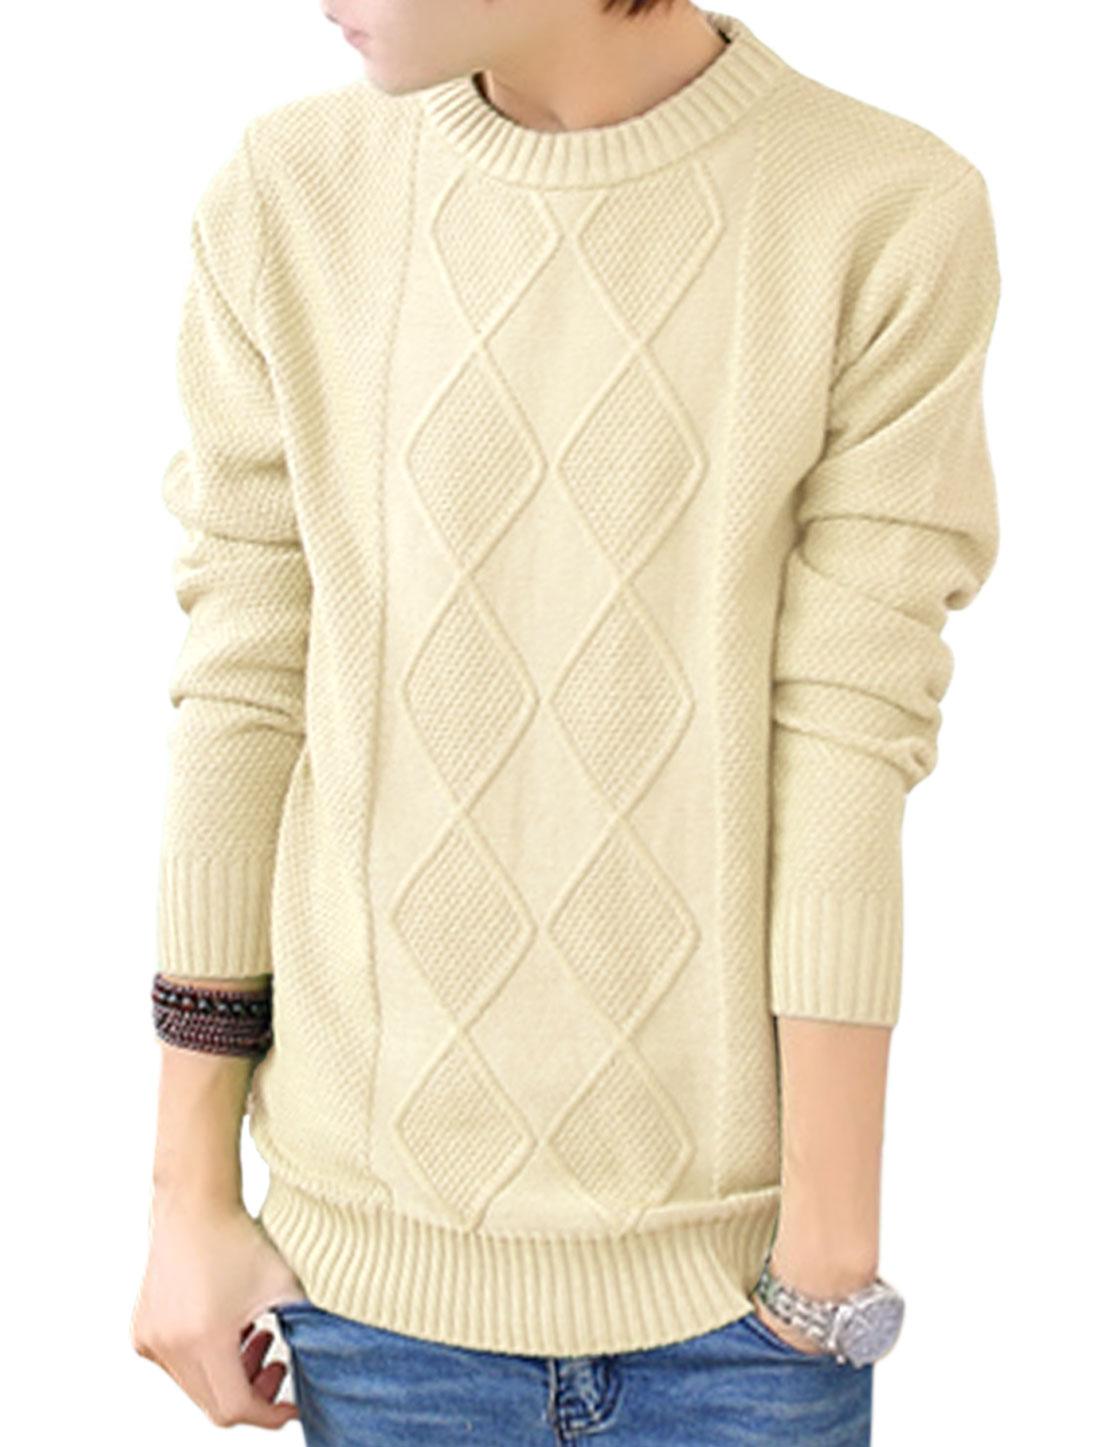 Men Pullover Long Sleeves Argle Design Beige Sweater S